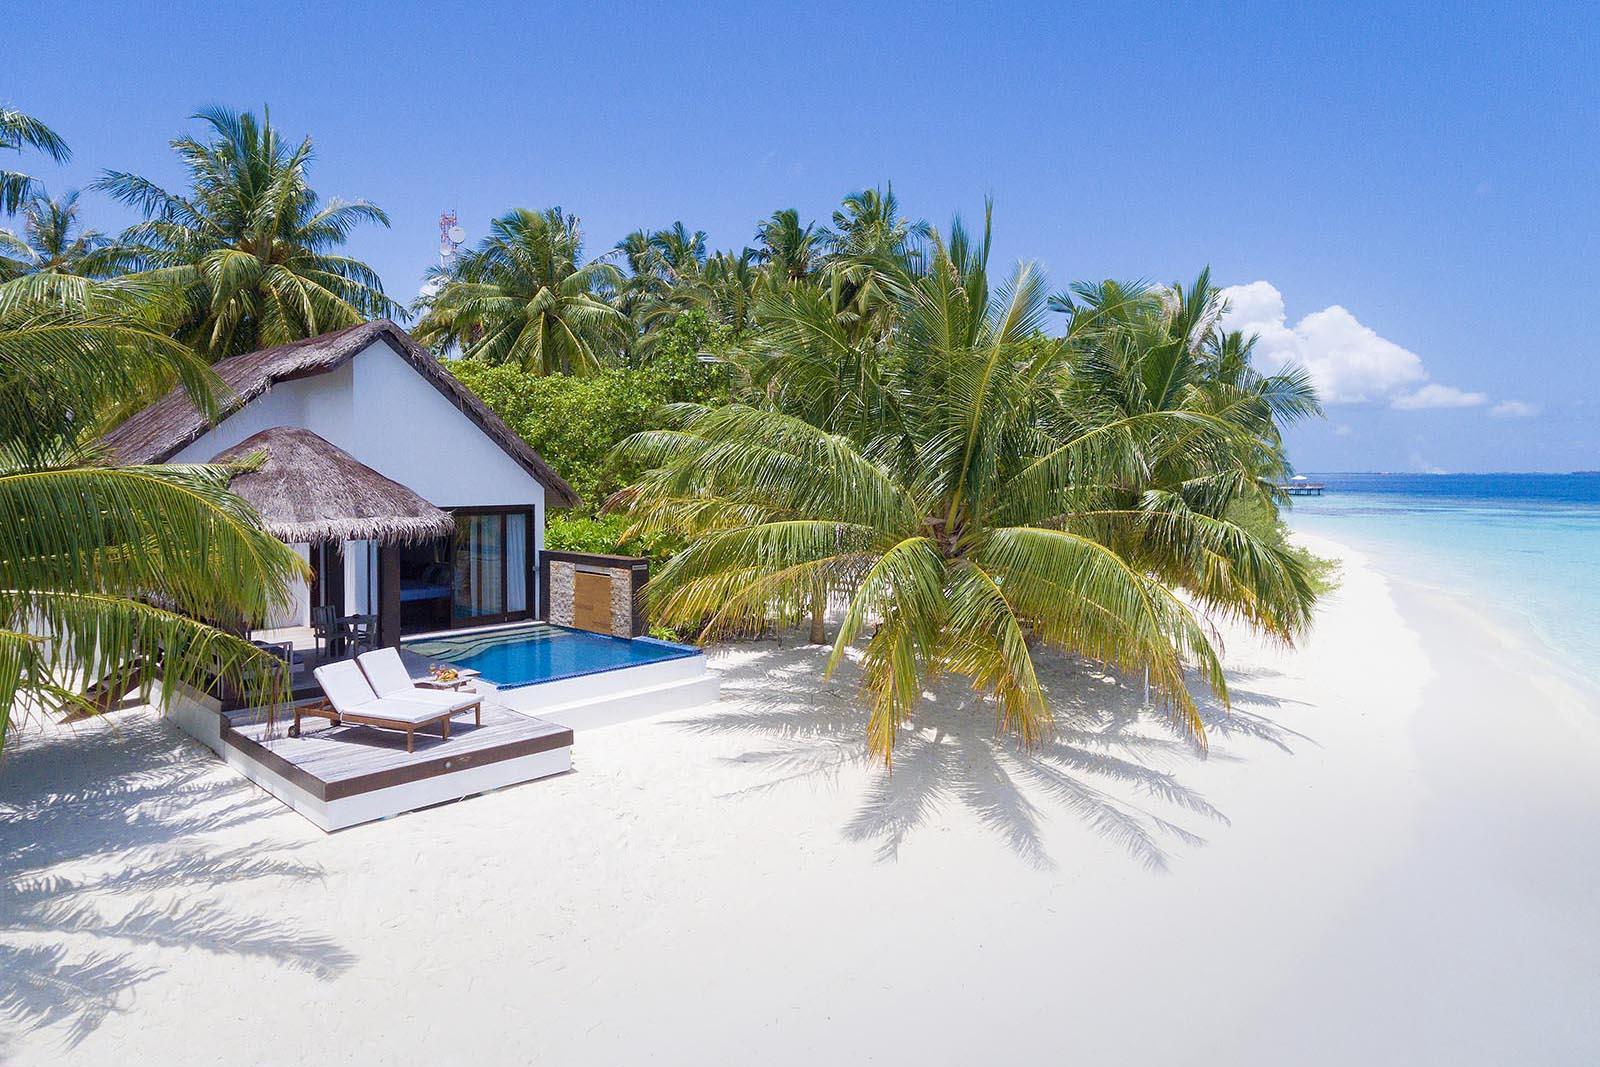 Фото Bandos Maldives